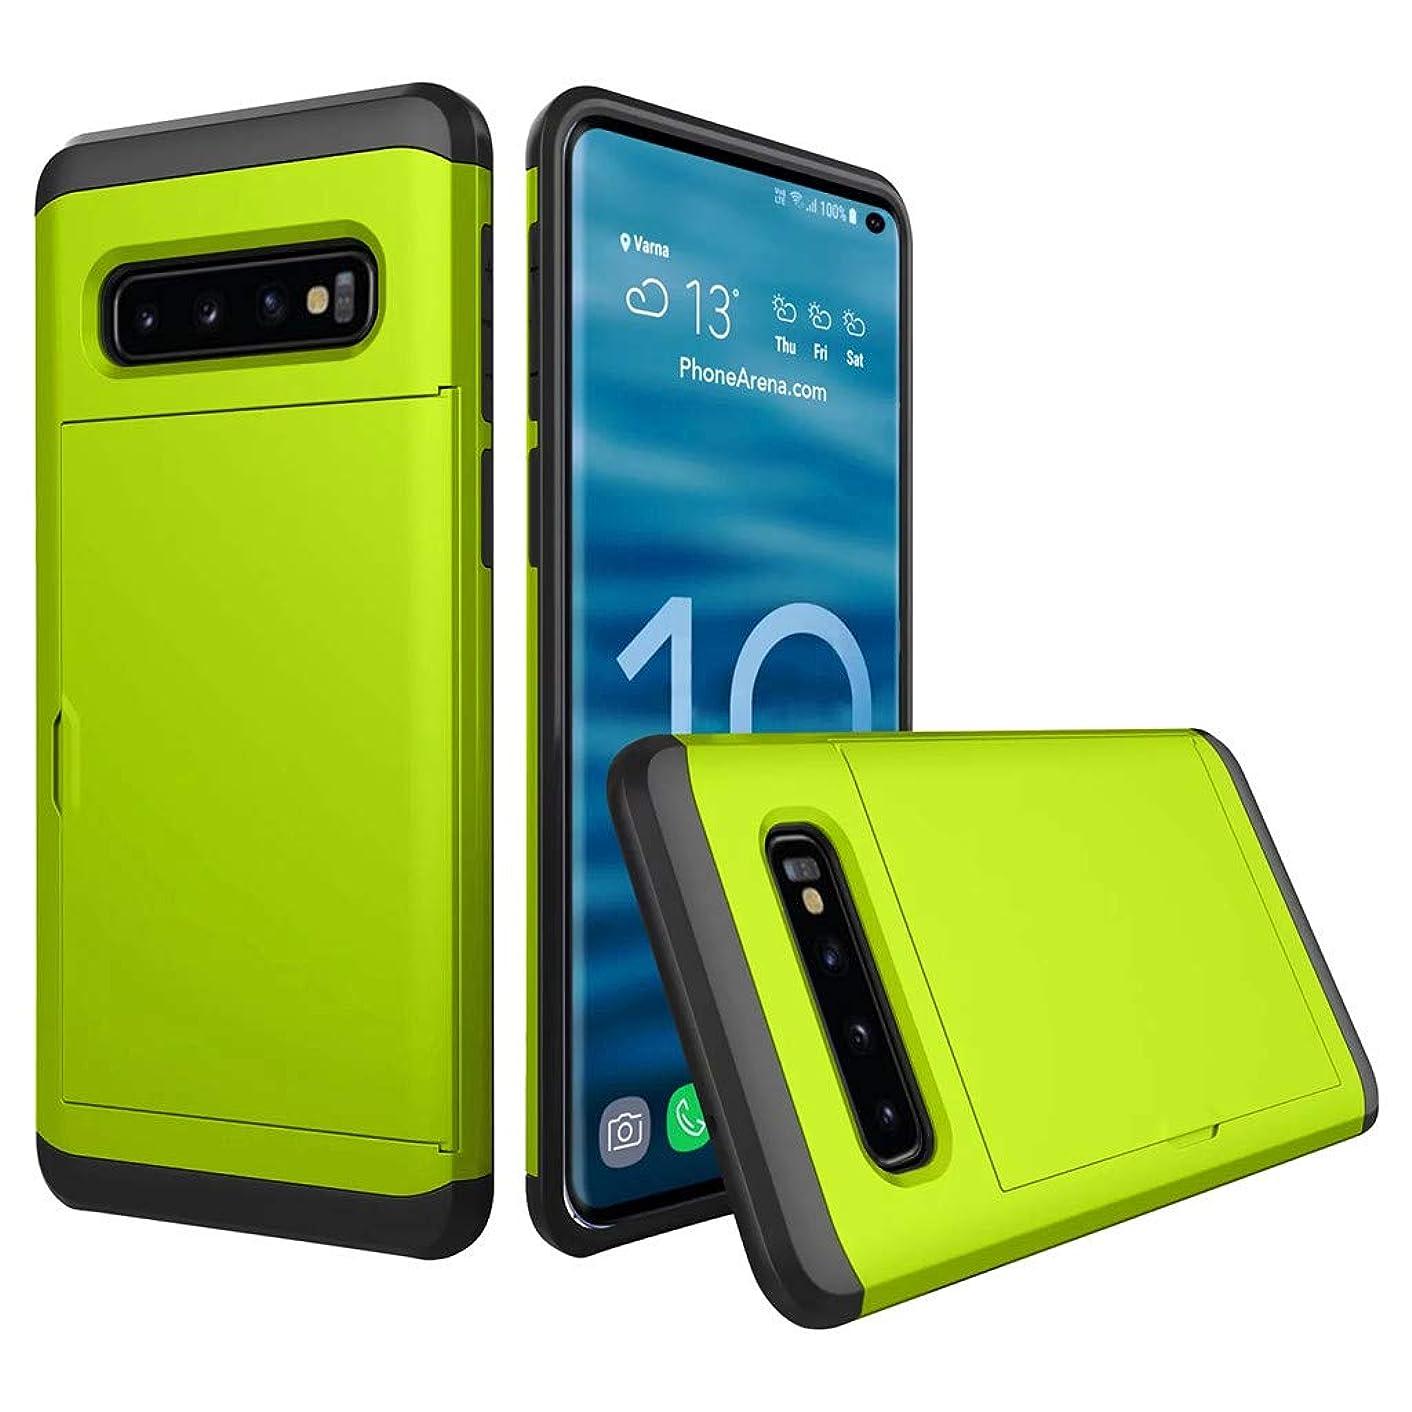 for Smasung Galaxy s10/s10 Plus/S10e Phone Case, Iusun Ultra-Thin Luxury Hard PC+Silica Gel Protective Case Cover Bumper